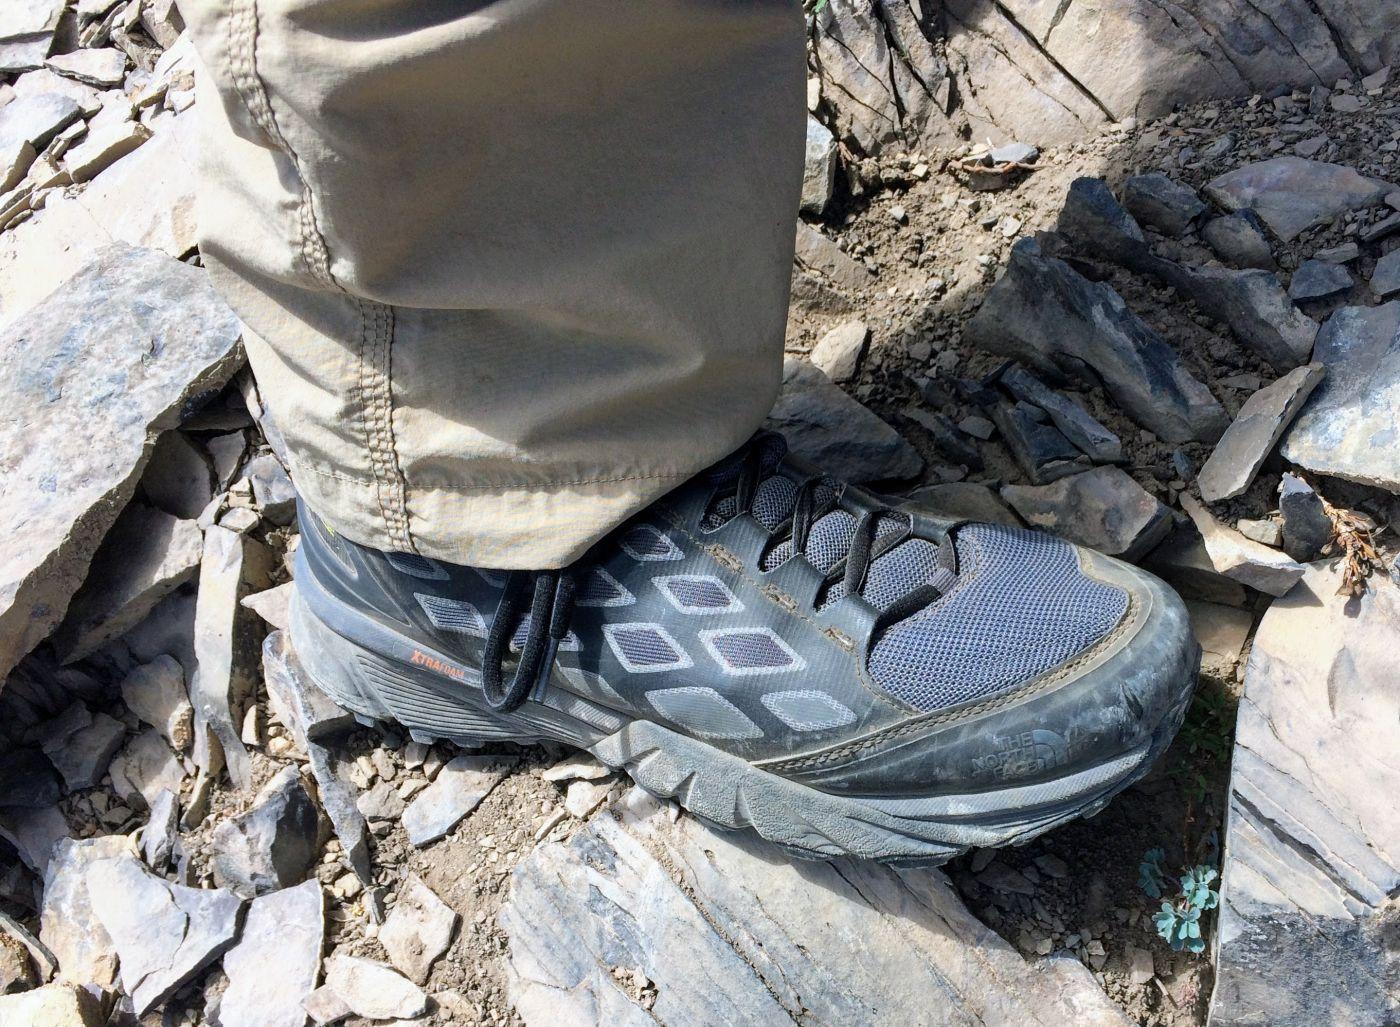 91693cc5d9e Review: The North Face Endurus GTX Hike Mid - FeedTheHabit.com